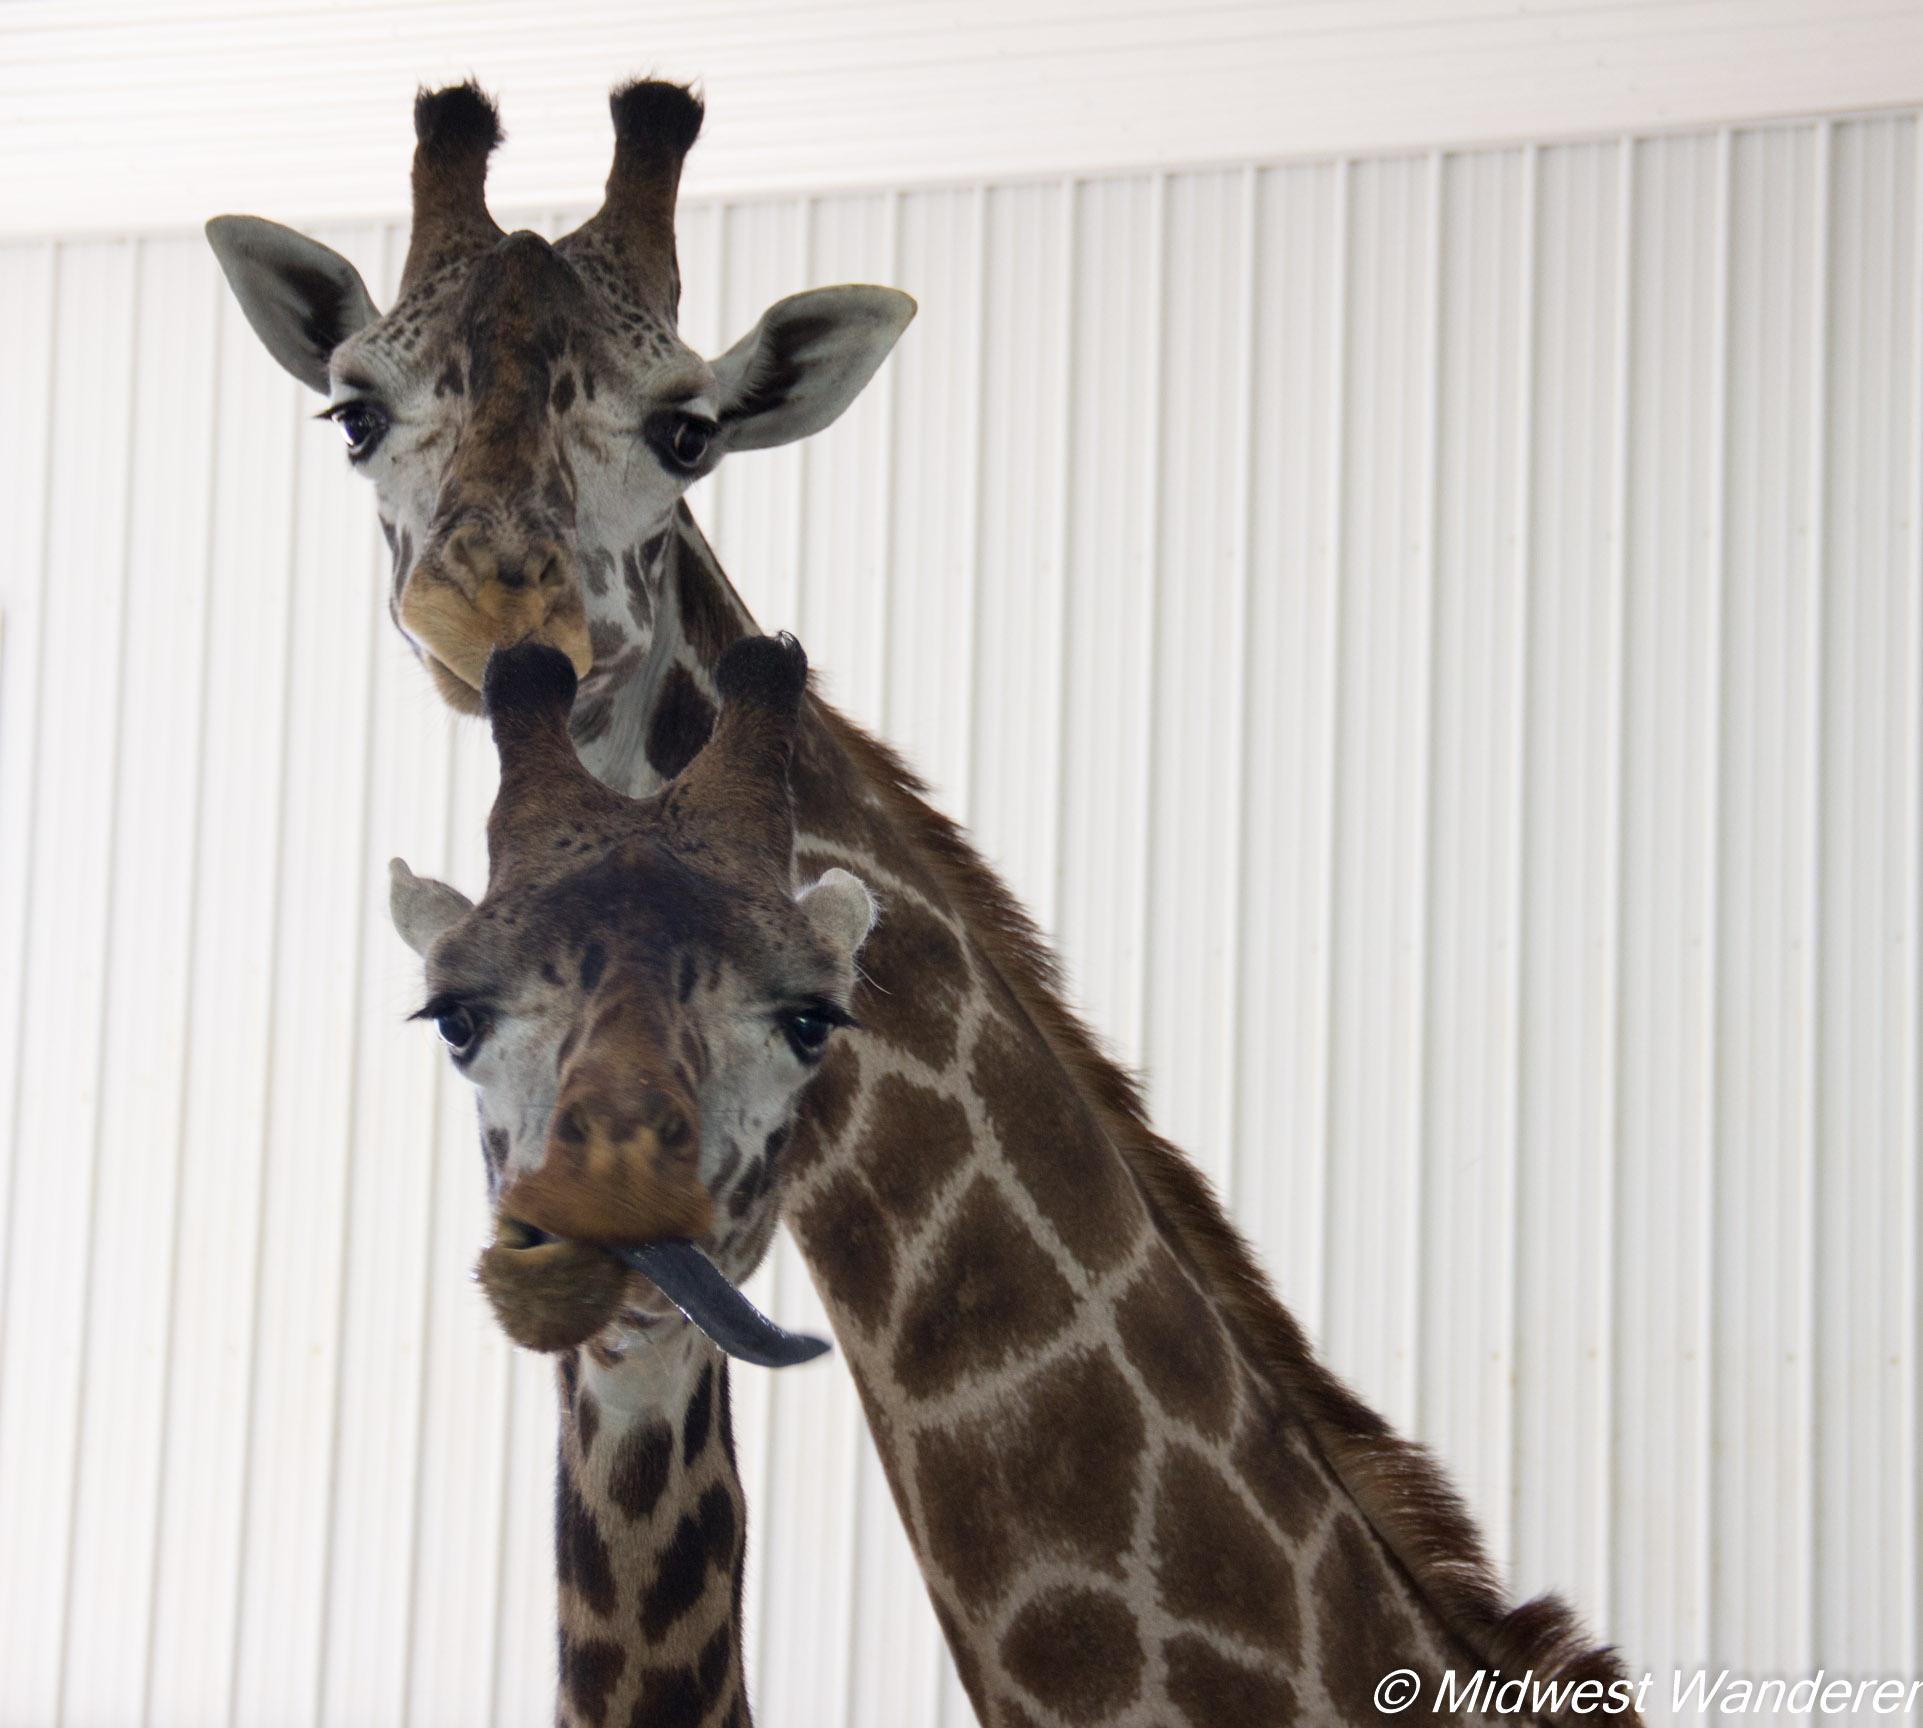 Wilstem Ranch Giraffe Encounter 7